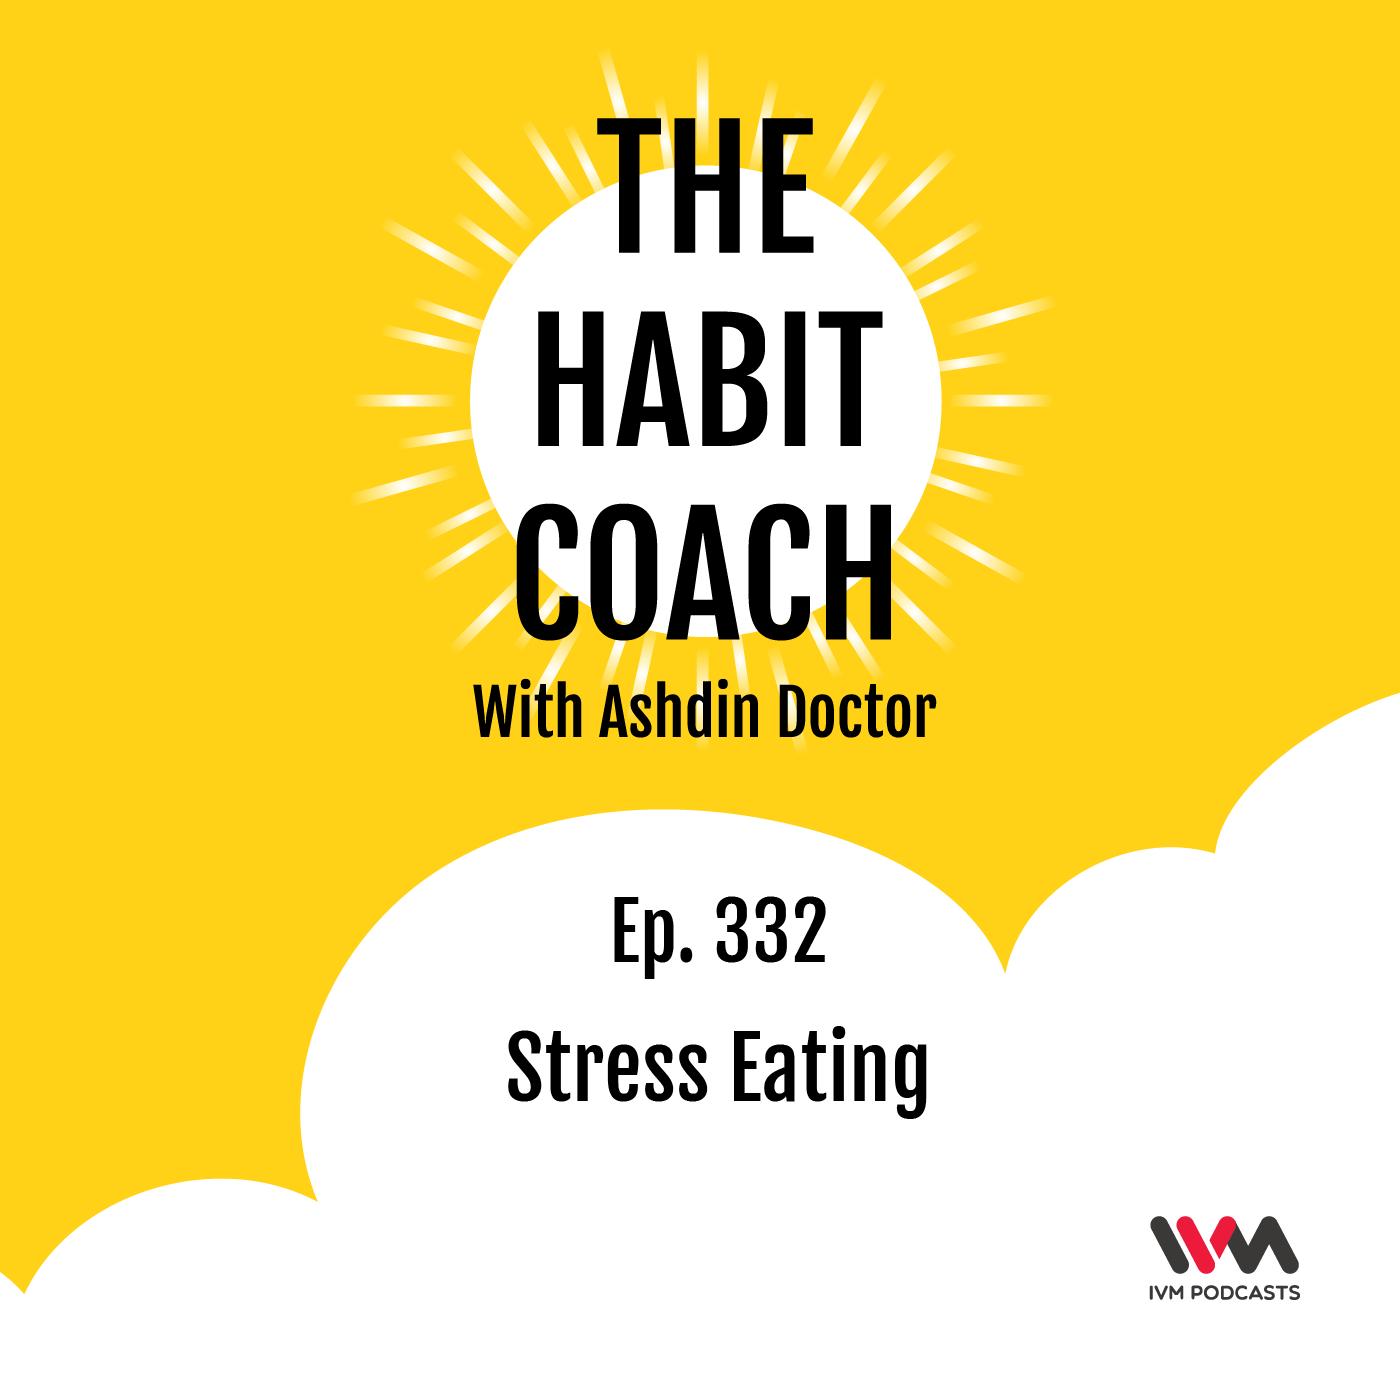 Ep. 332: Stress Eating